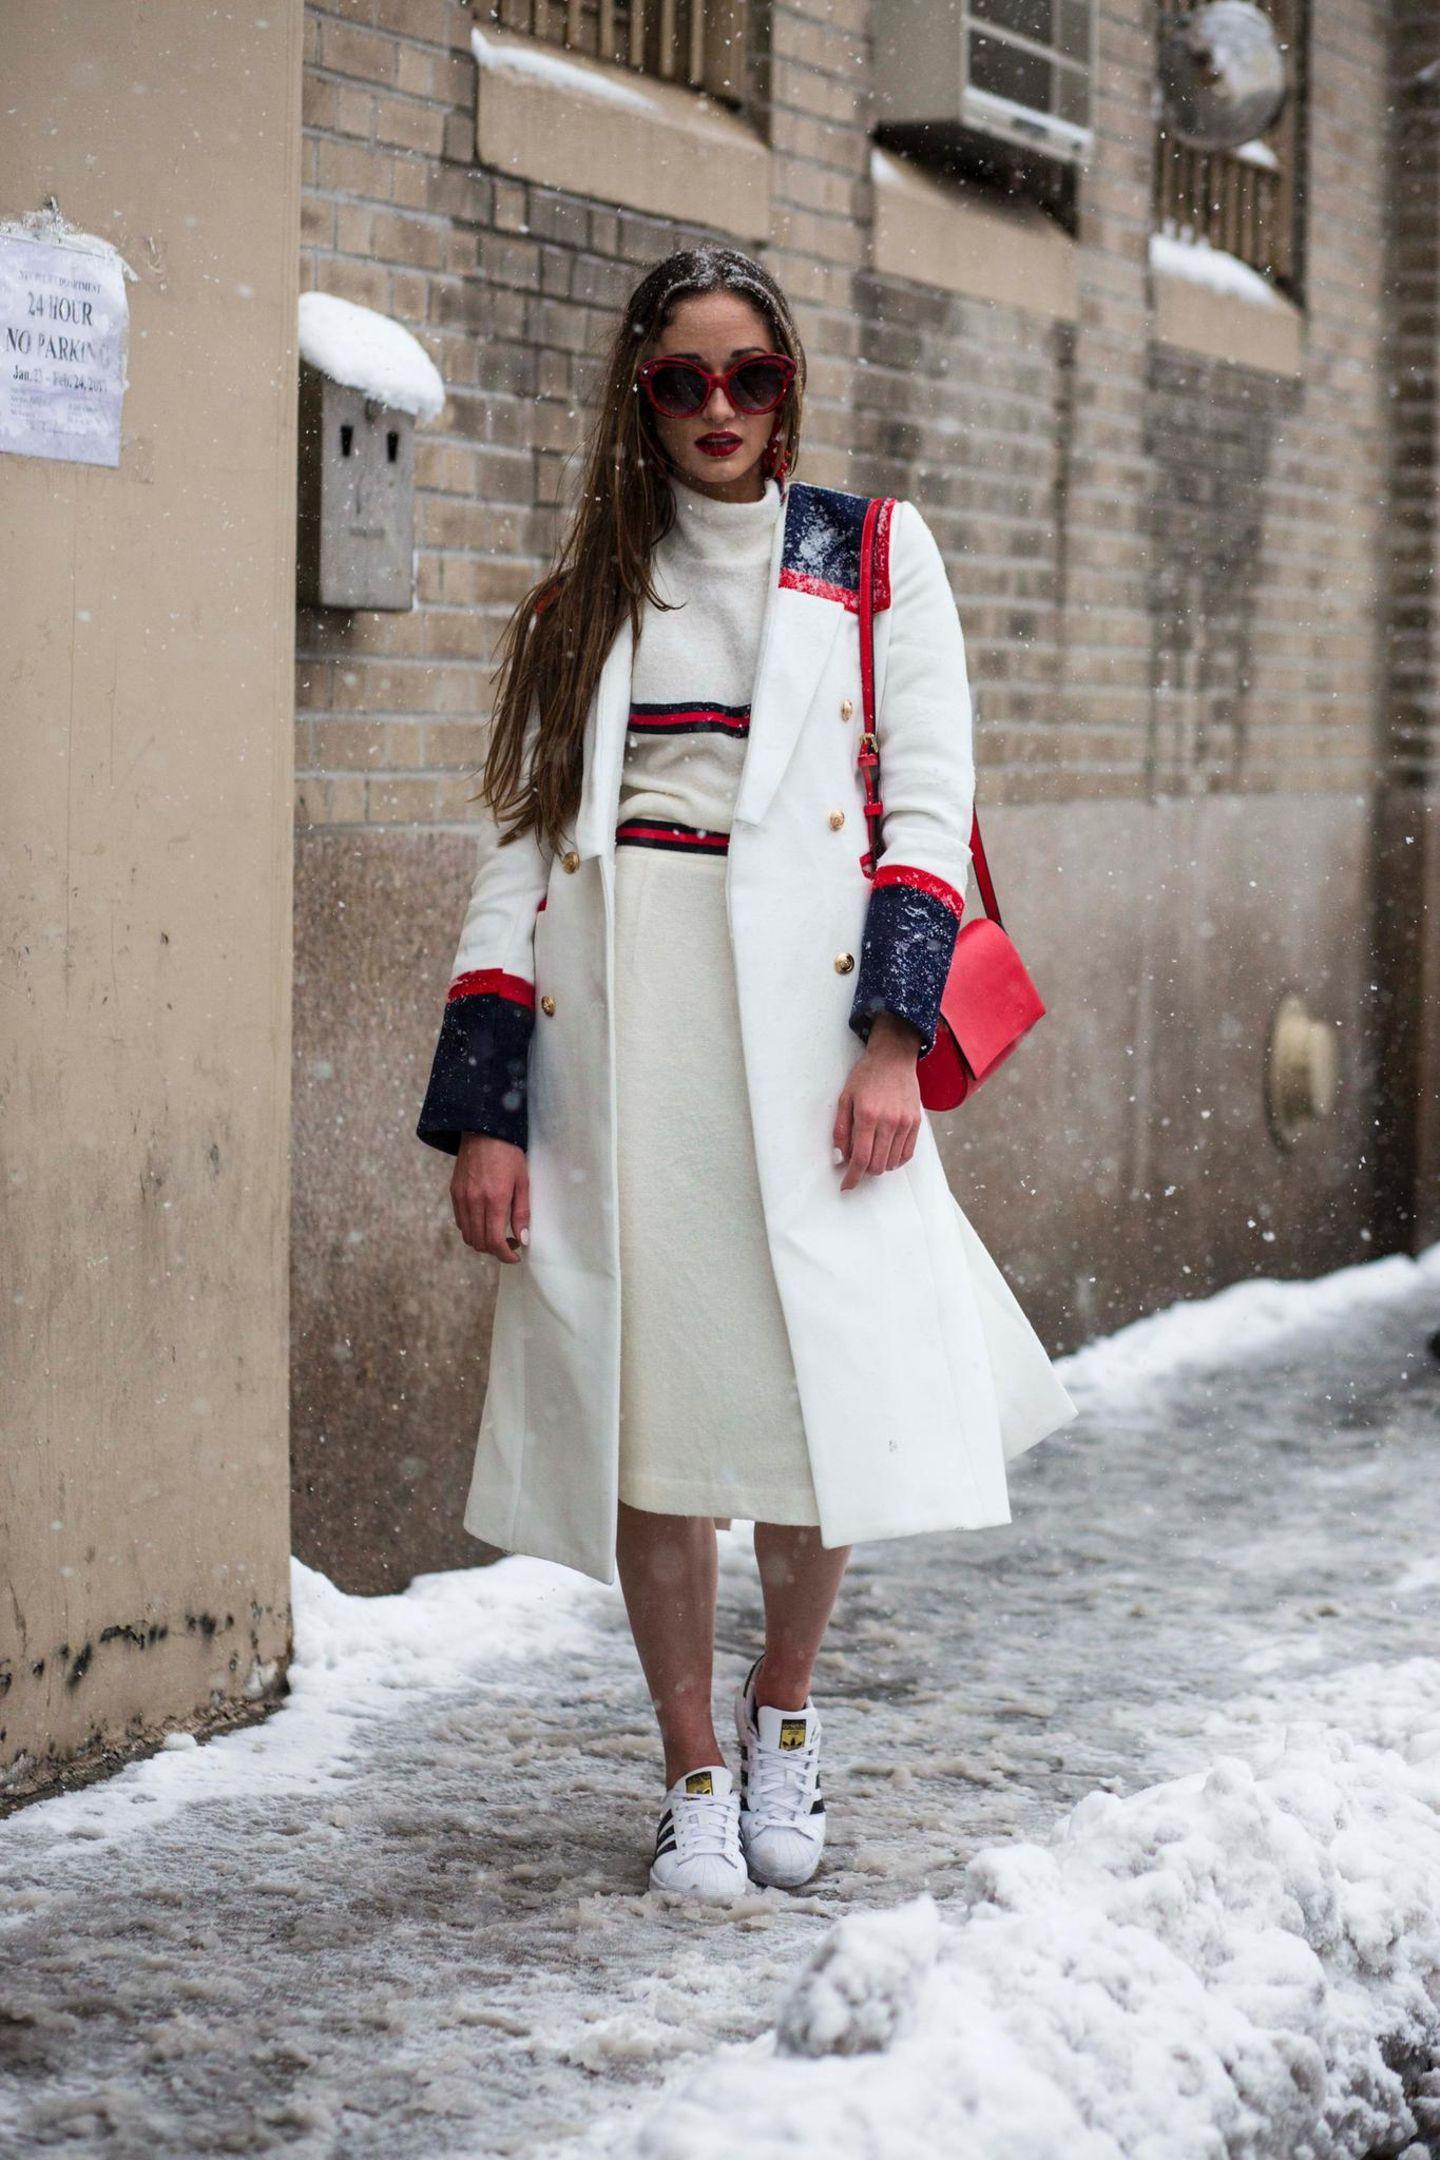 Streetstyle mit weißem Outfit